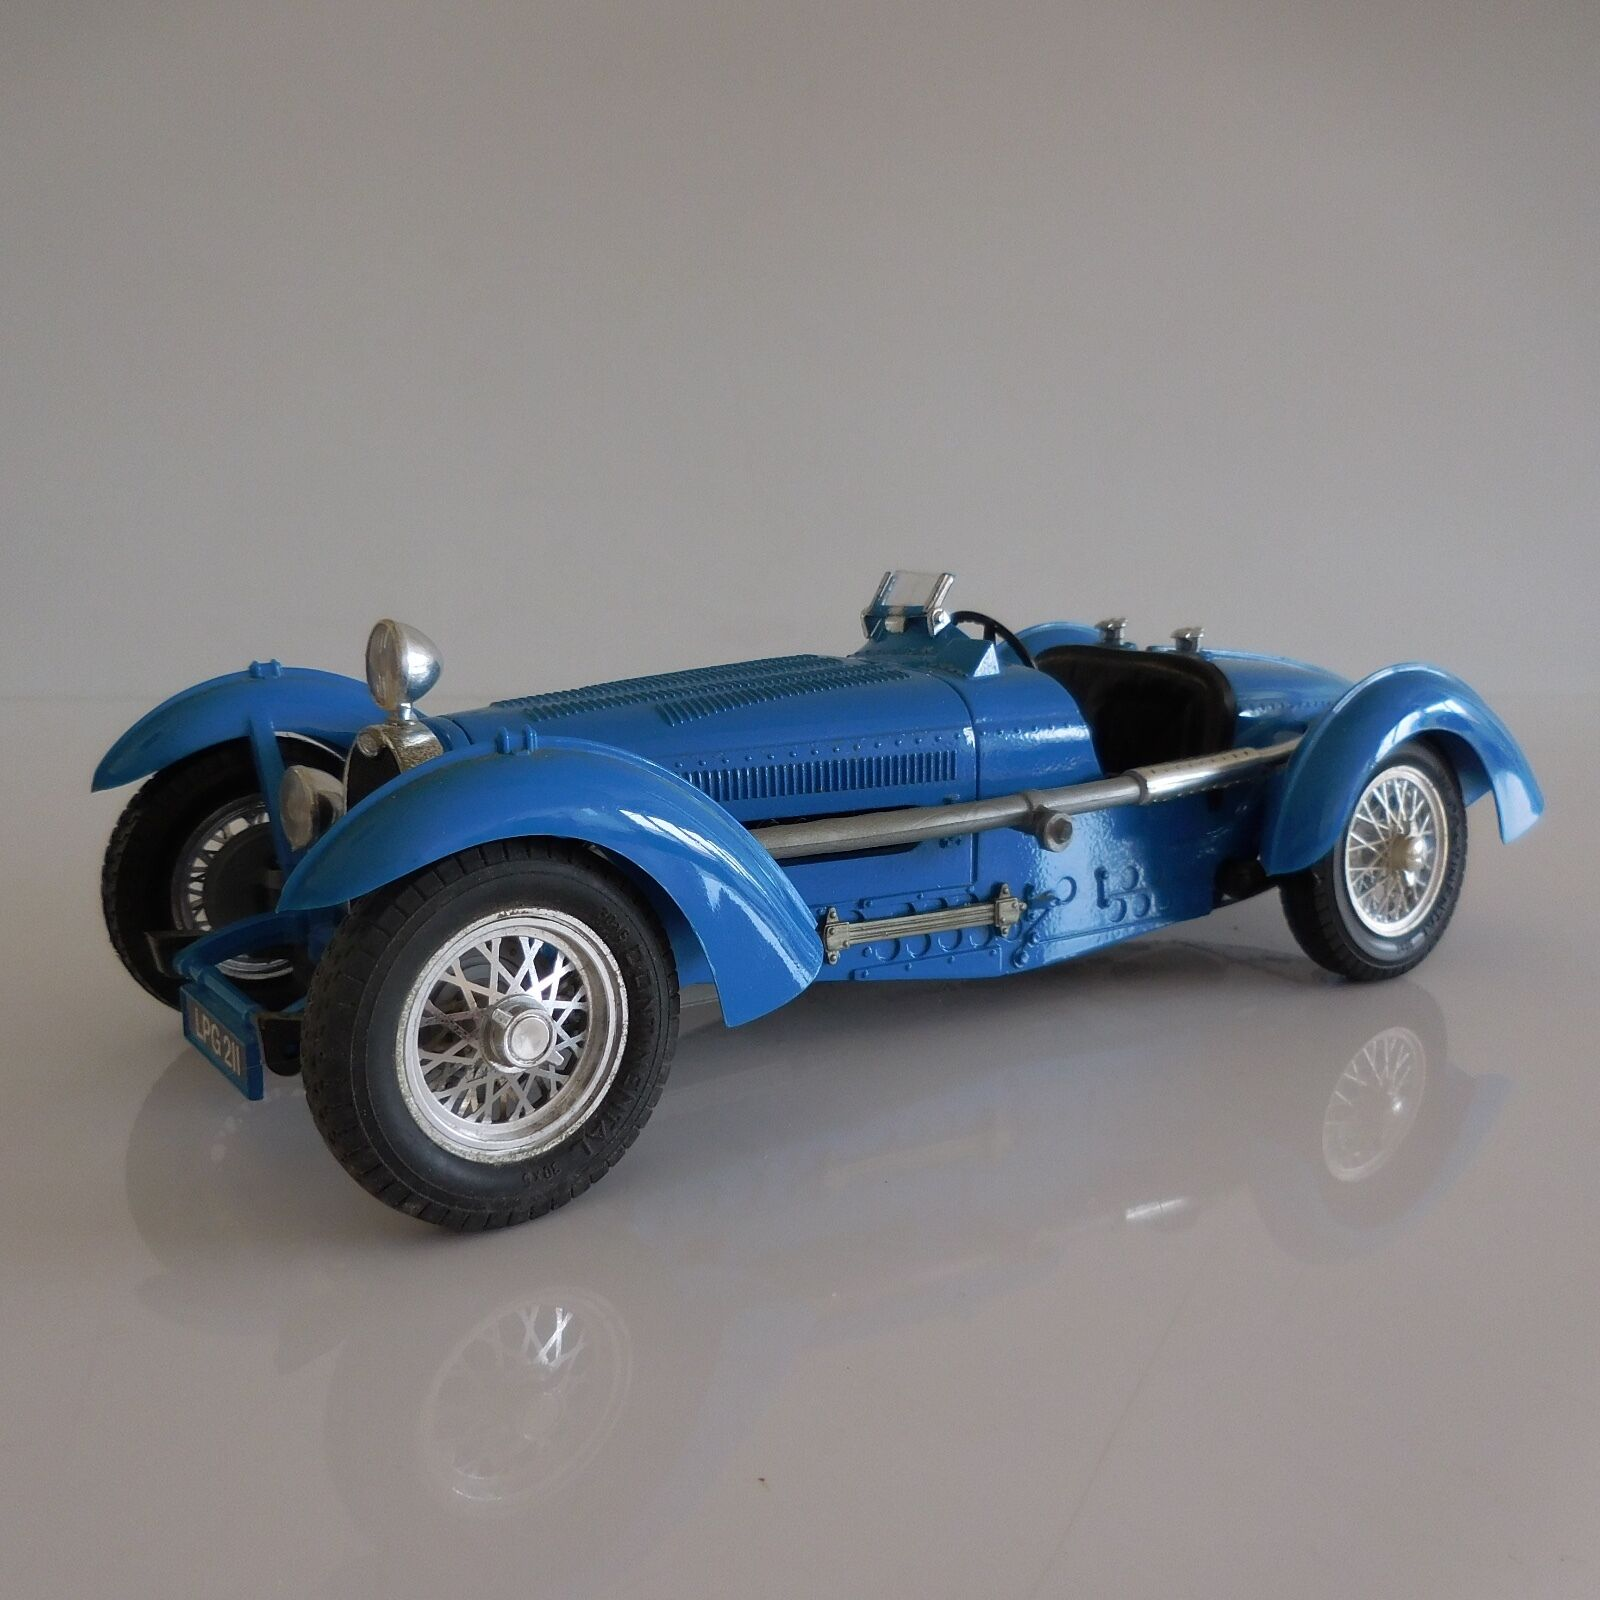 marcas en línea venta barata BUGATTI BUGATTI BUGATTI type 59 1934 BURAGO made in ITALY  mejor calidad mejor precio